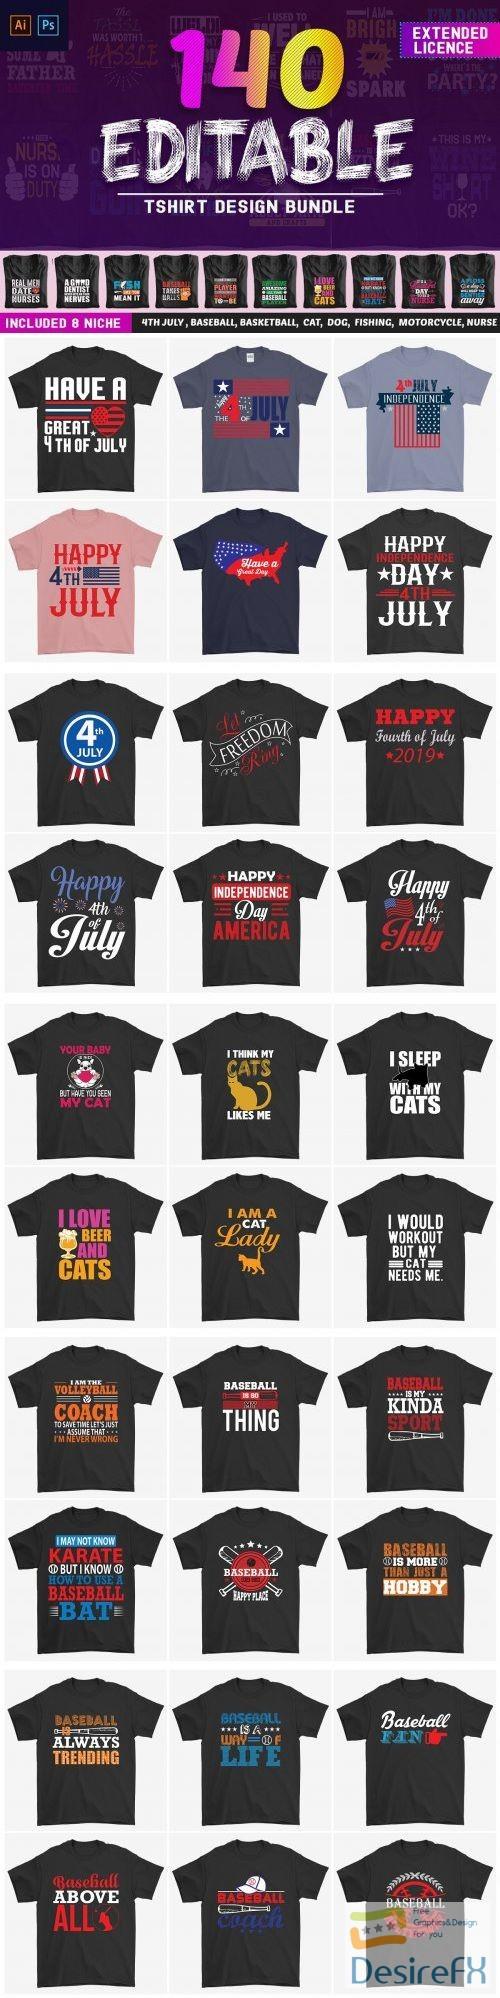 t-shirts-prints - 140 Editable T-shirt Design Bundle - 3888198